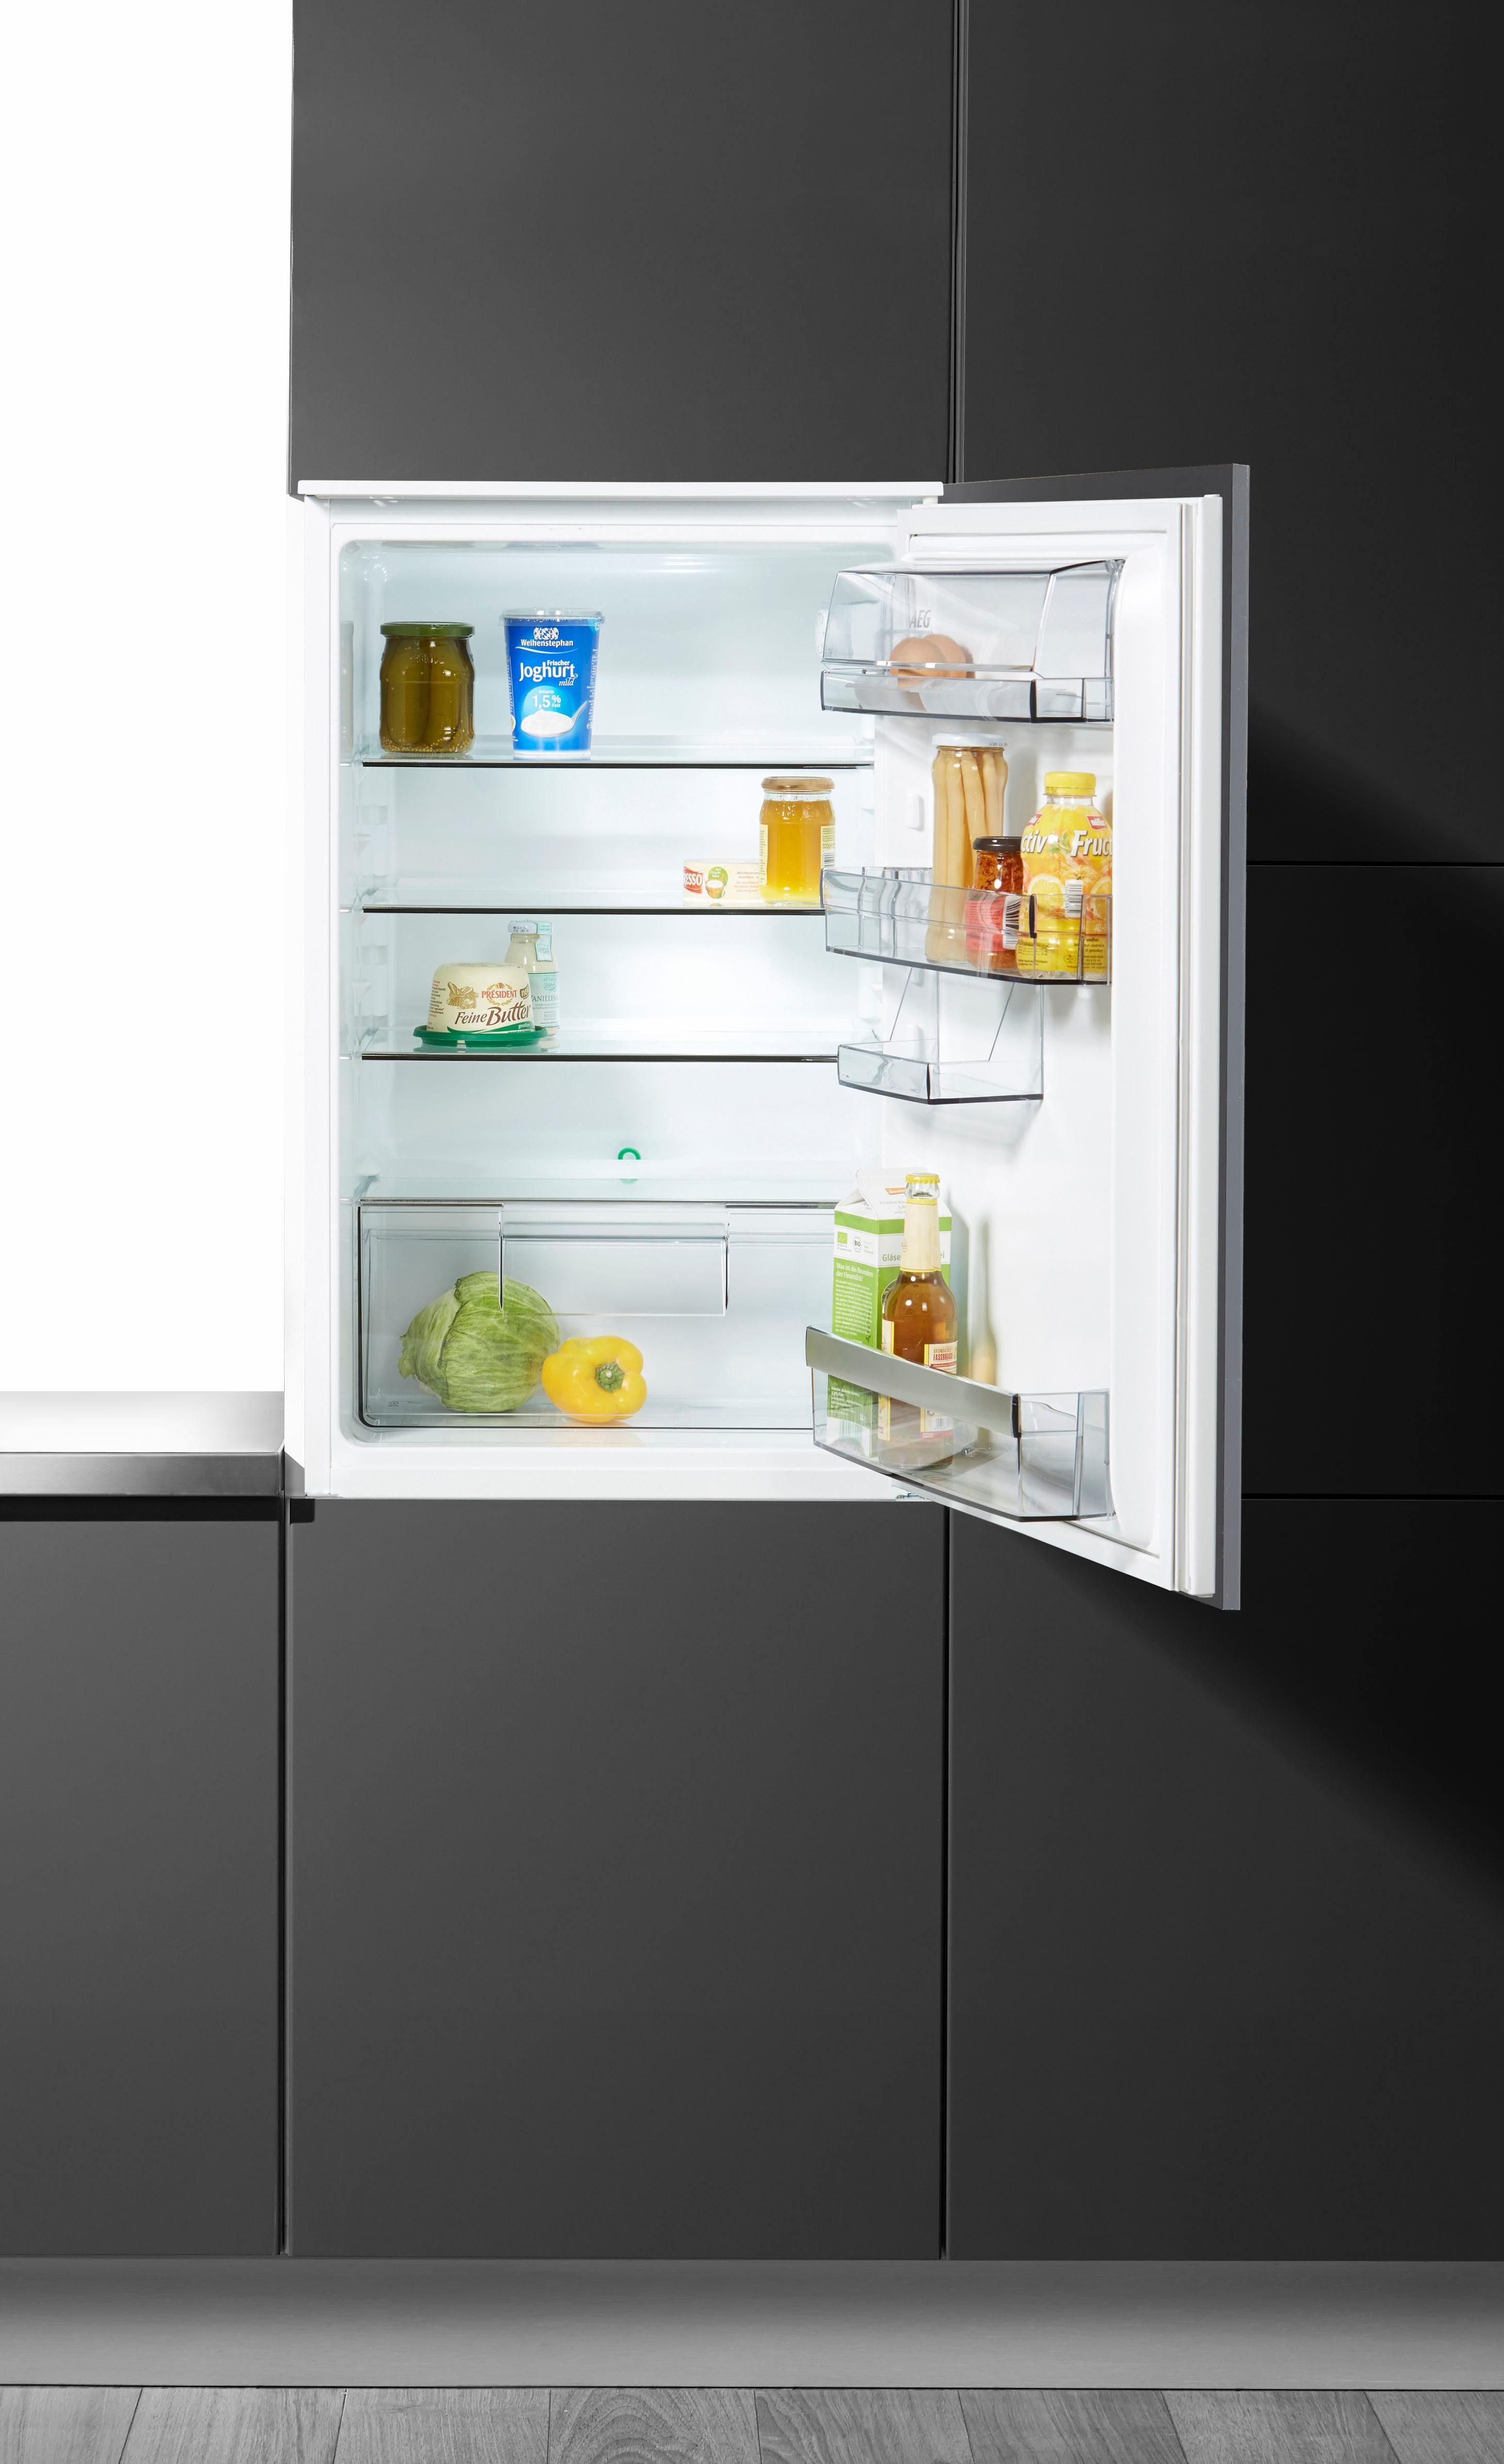 AEG Einbaukühlschrank SANTO SKB58831AS, 87,3 cm hoch, 54,0 cm breit, A+++, 88 cm hoch, integrierbar